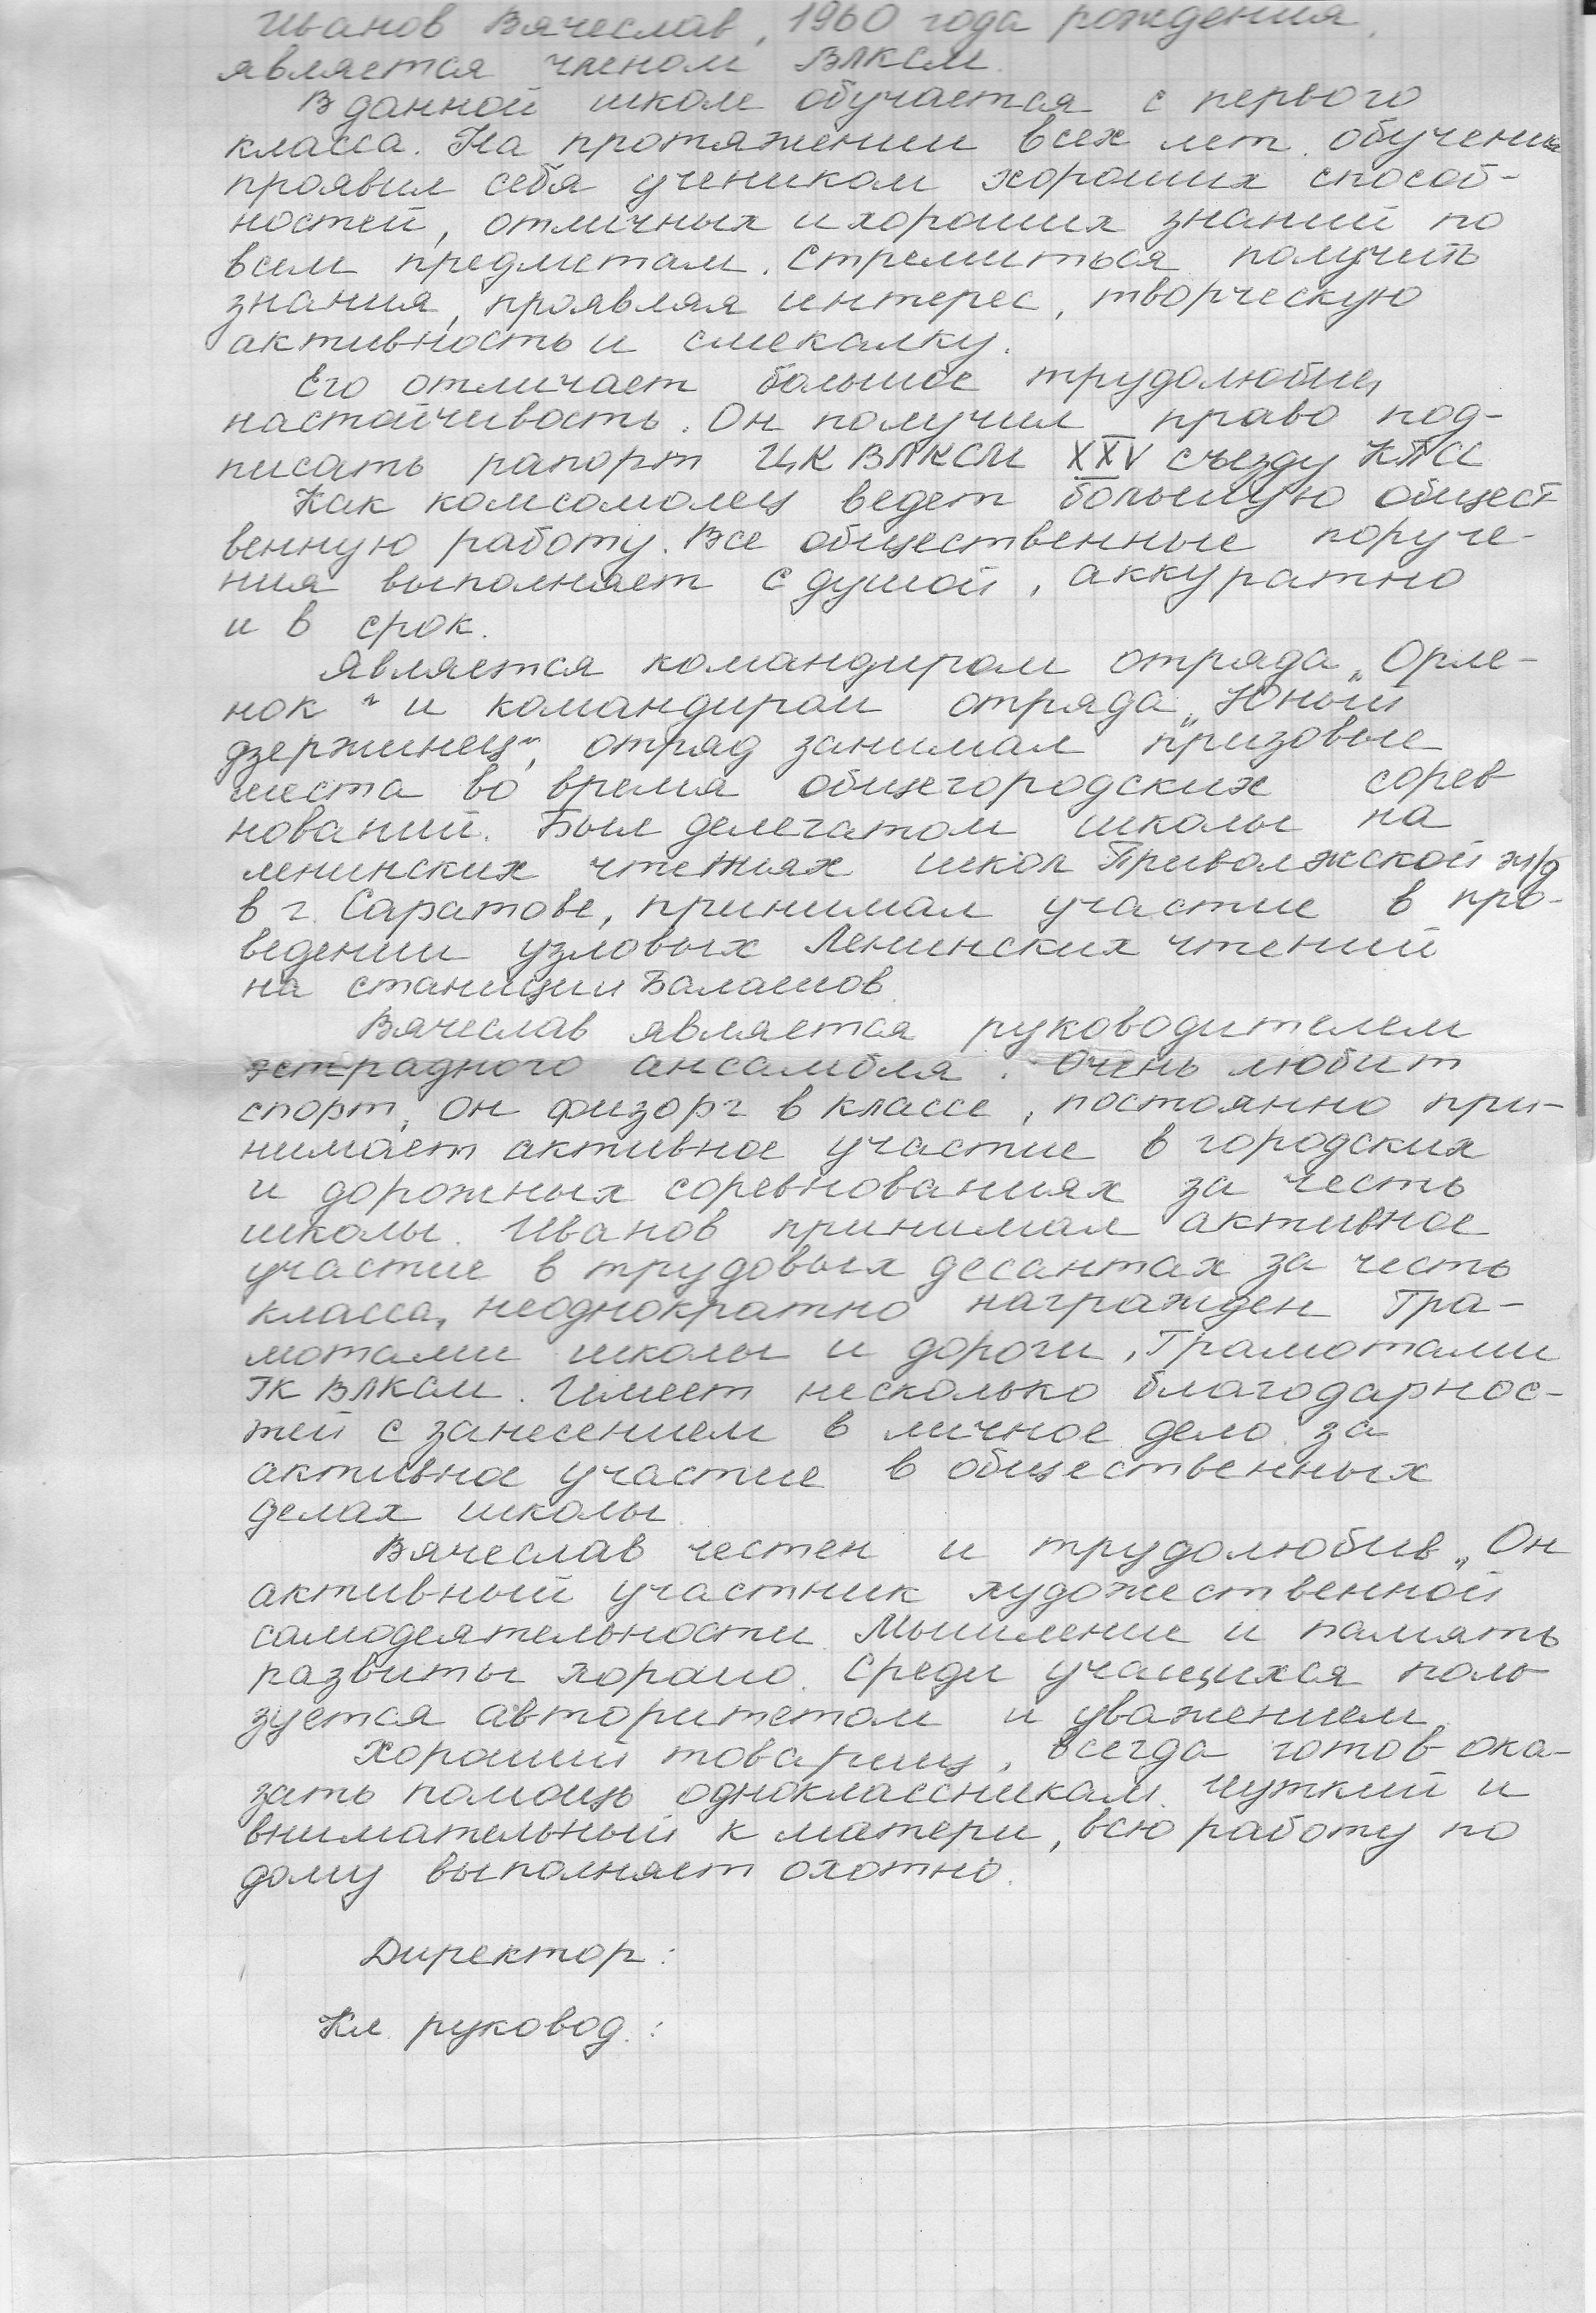 http://s8.uploads.ru/TcROk.jpg